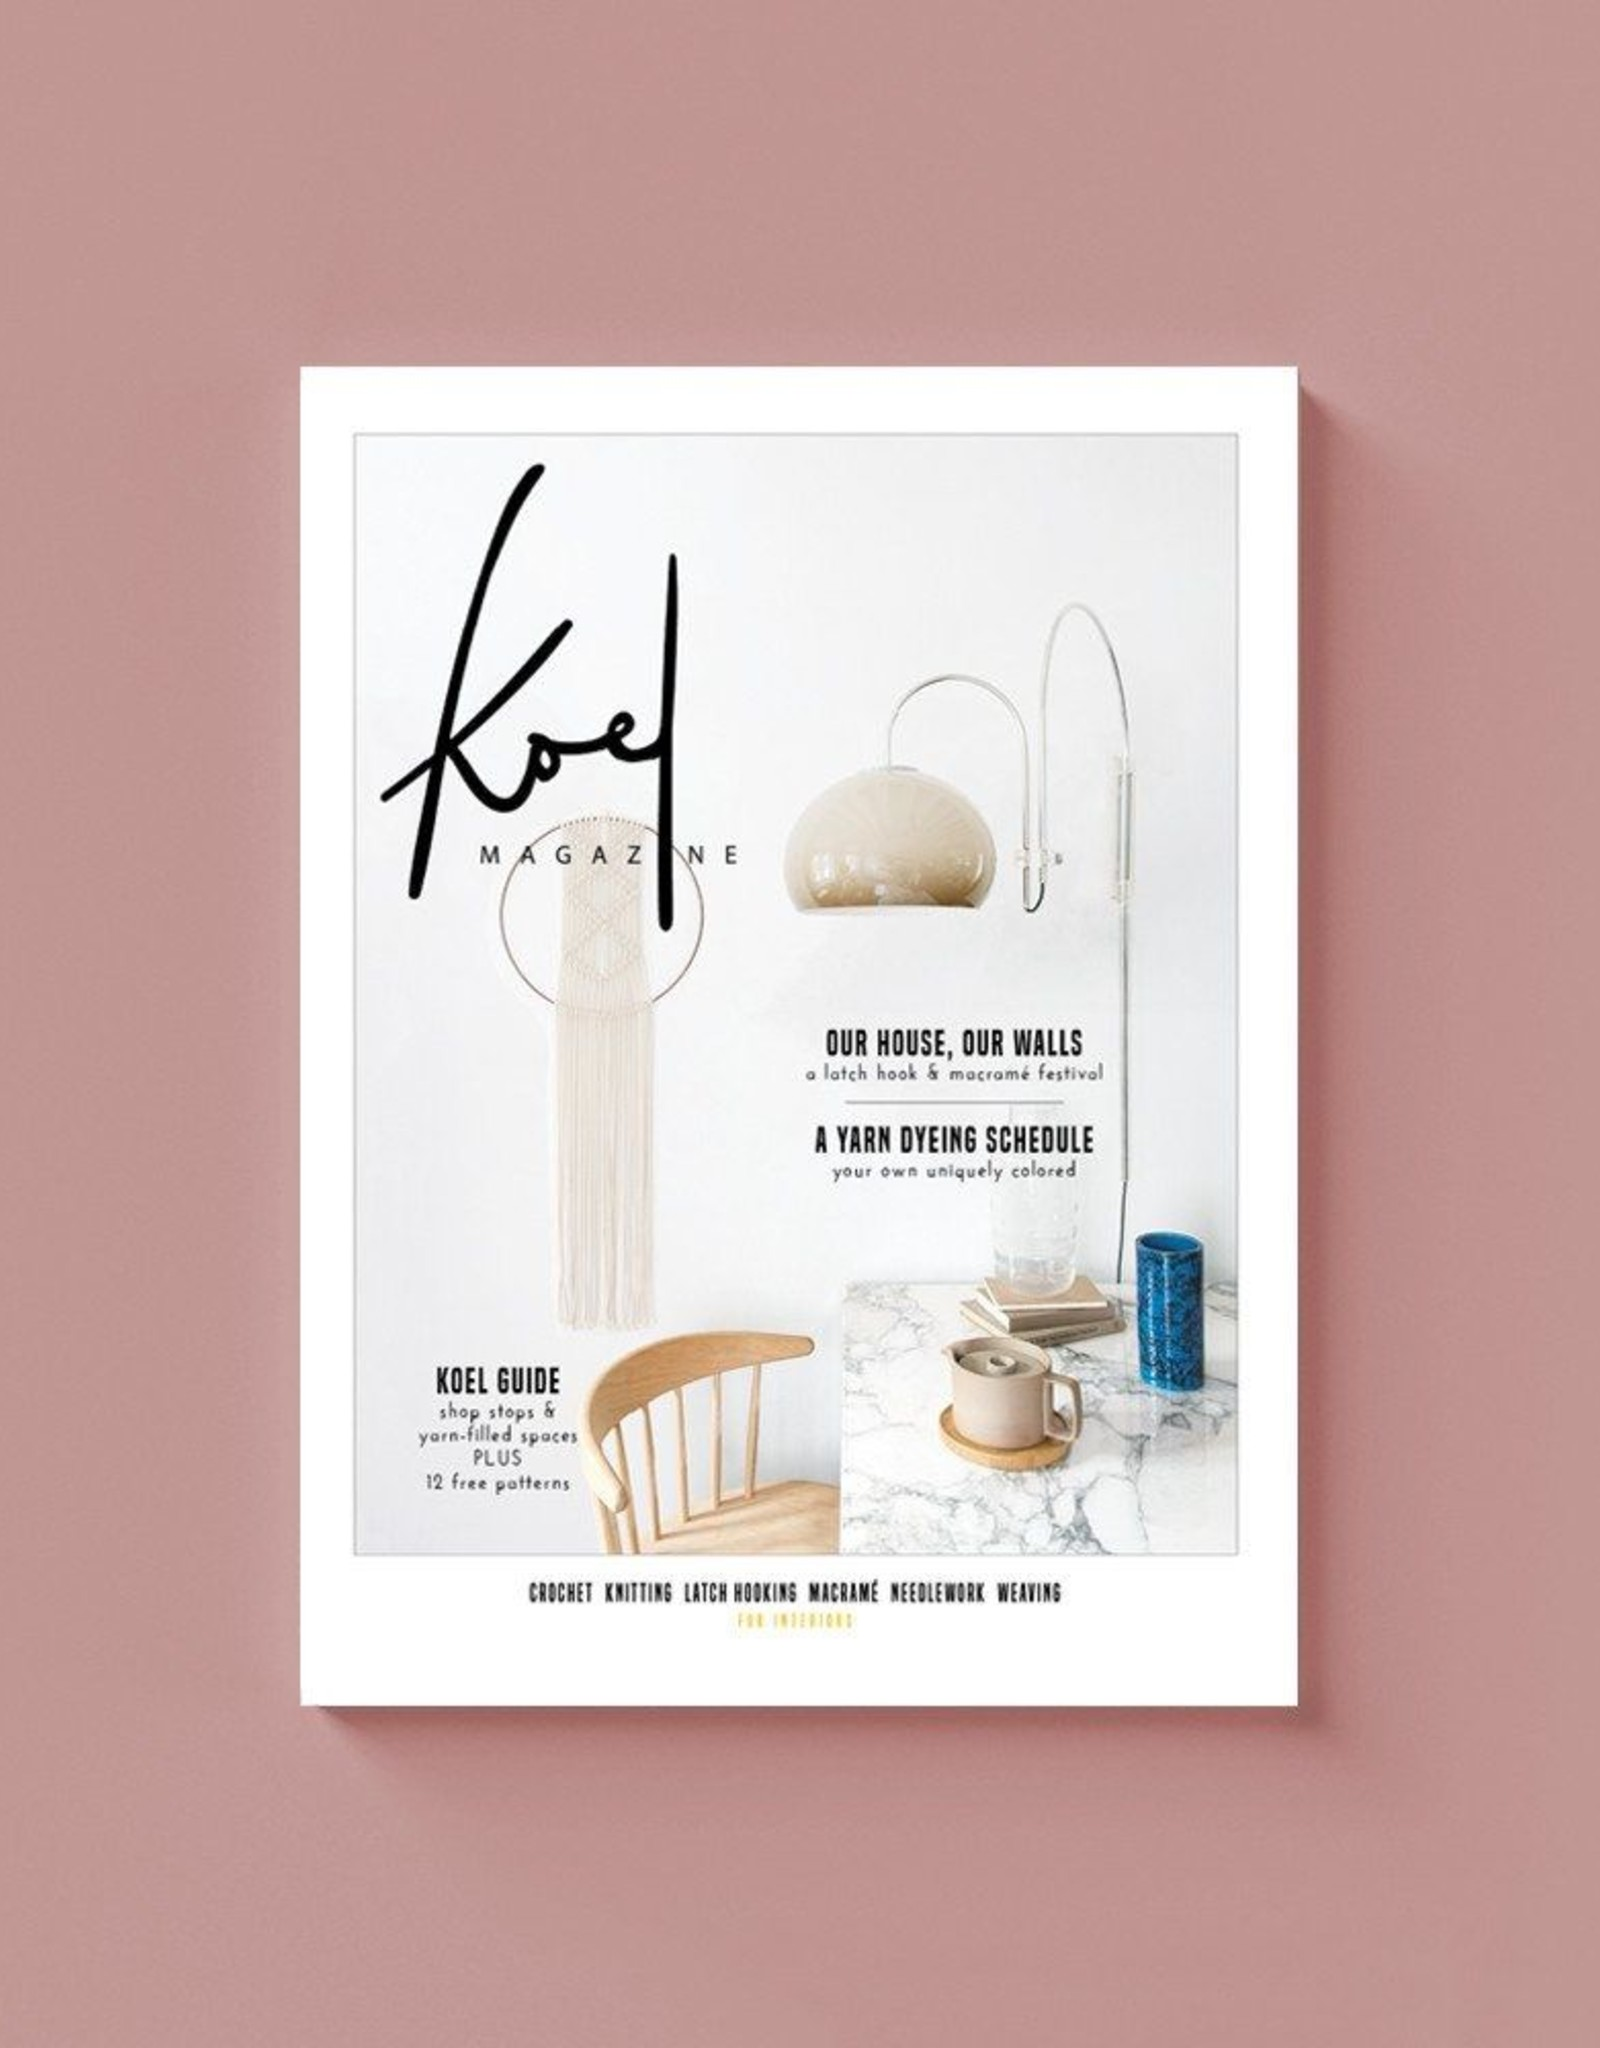 Koel Koel Magazine - Issue 2 Qtr 1 2017